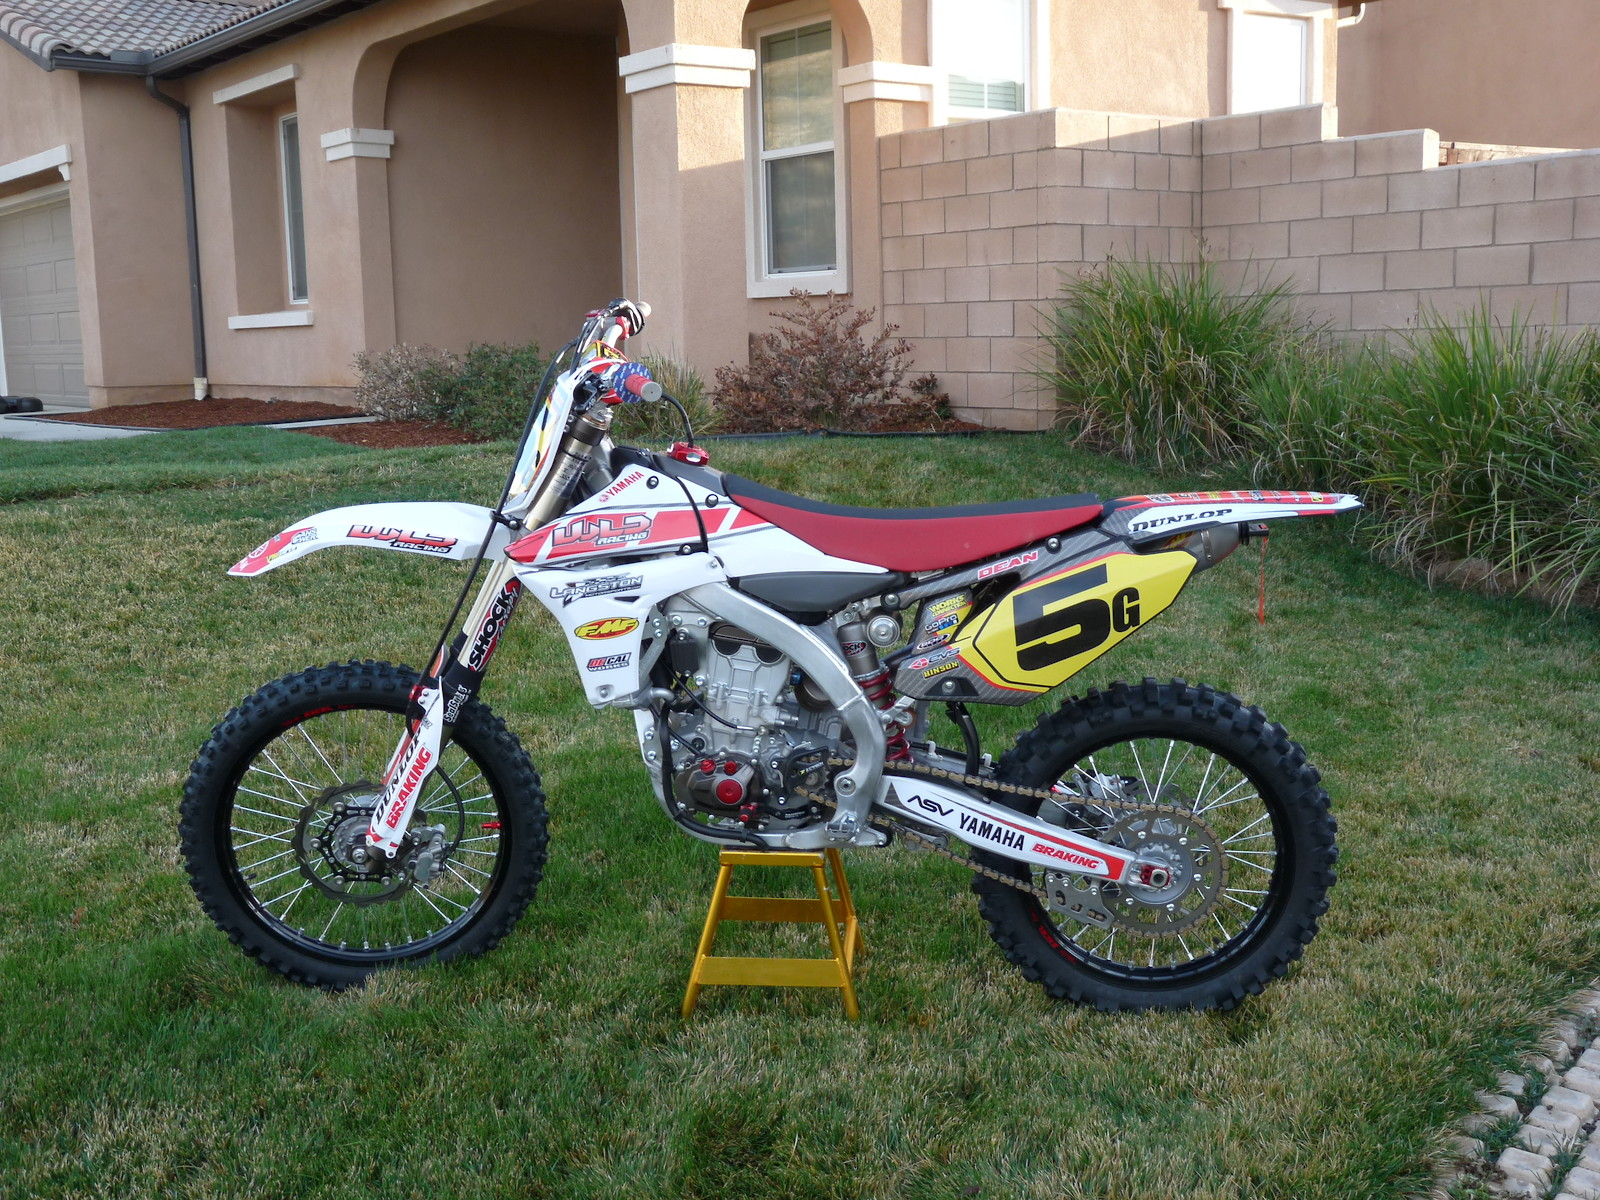 P1230517 - WLD - Motocross Pictures - Vital MX